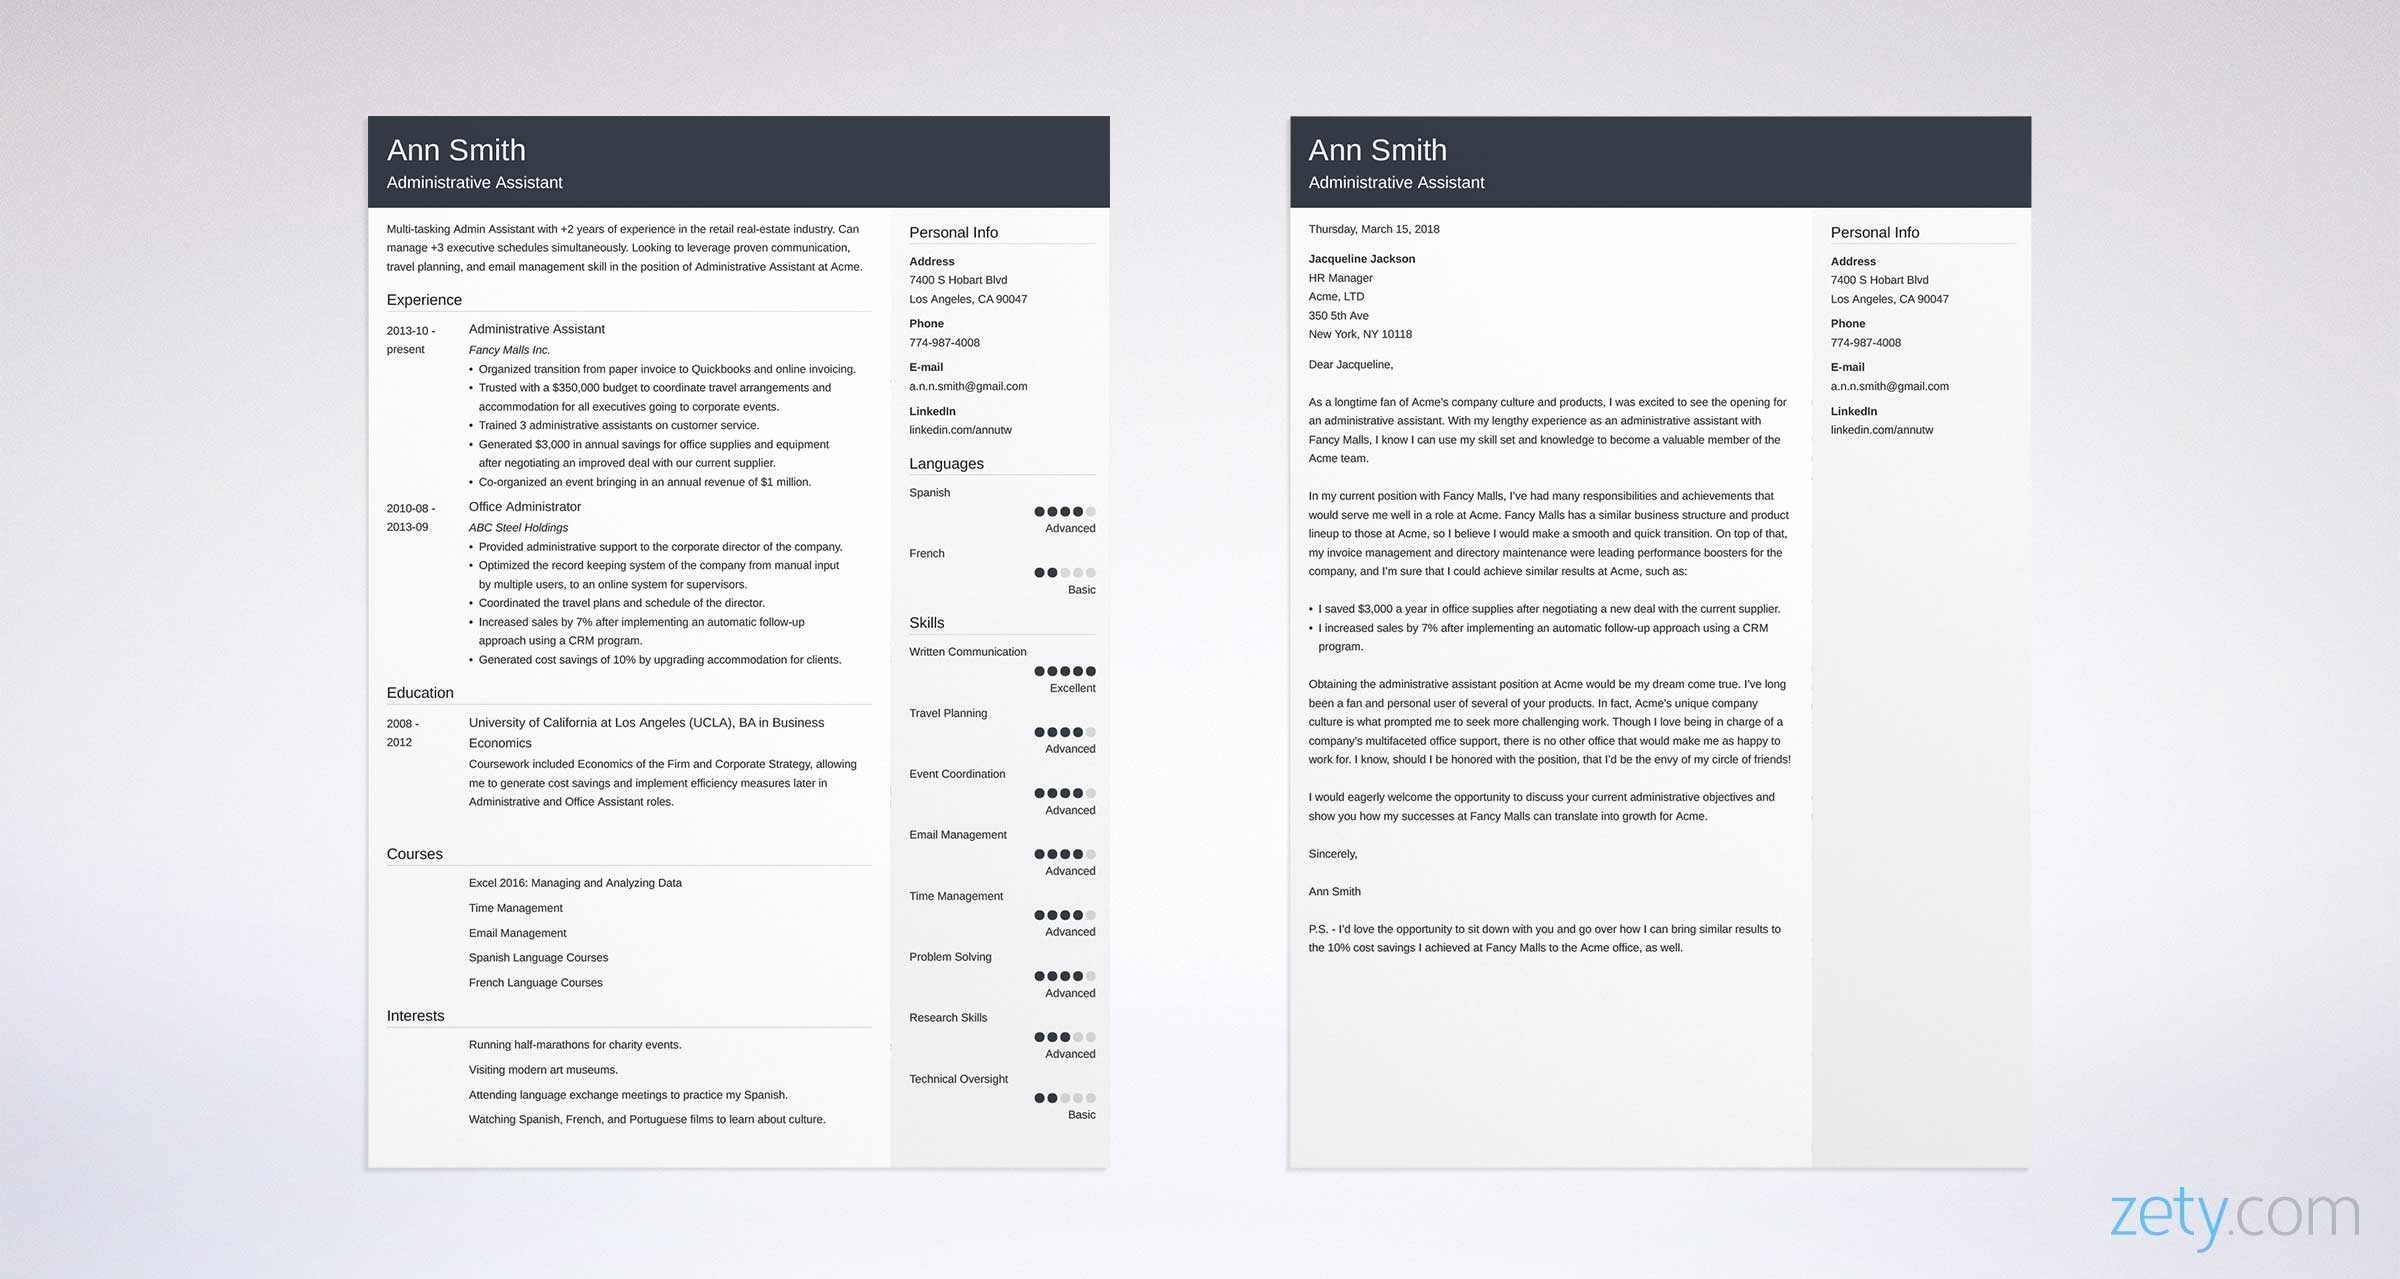 Sample Administrative Cover Letter Unique Administrative assistant Cover Letter Sample & Guide [20